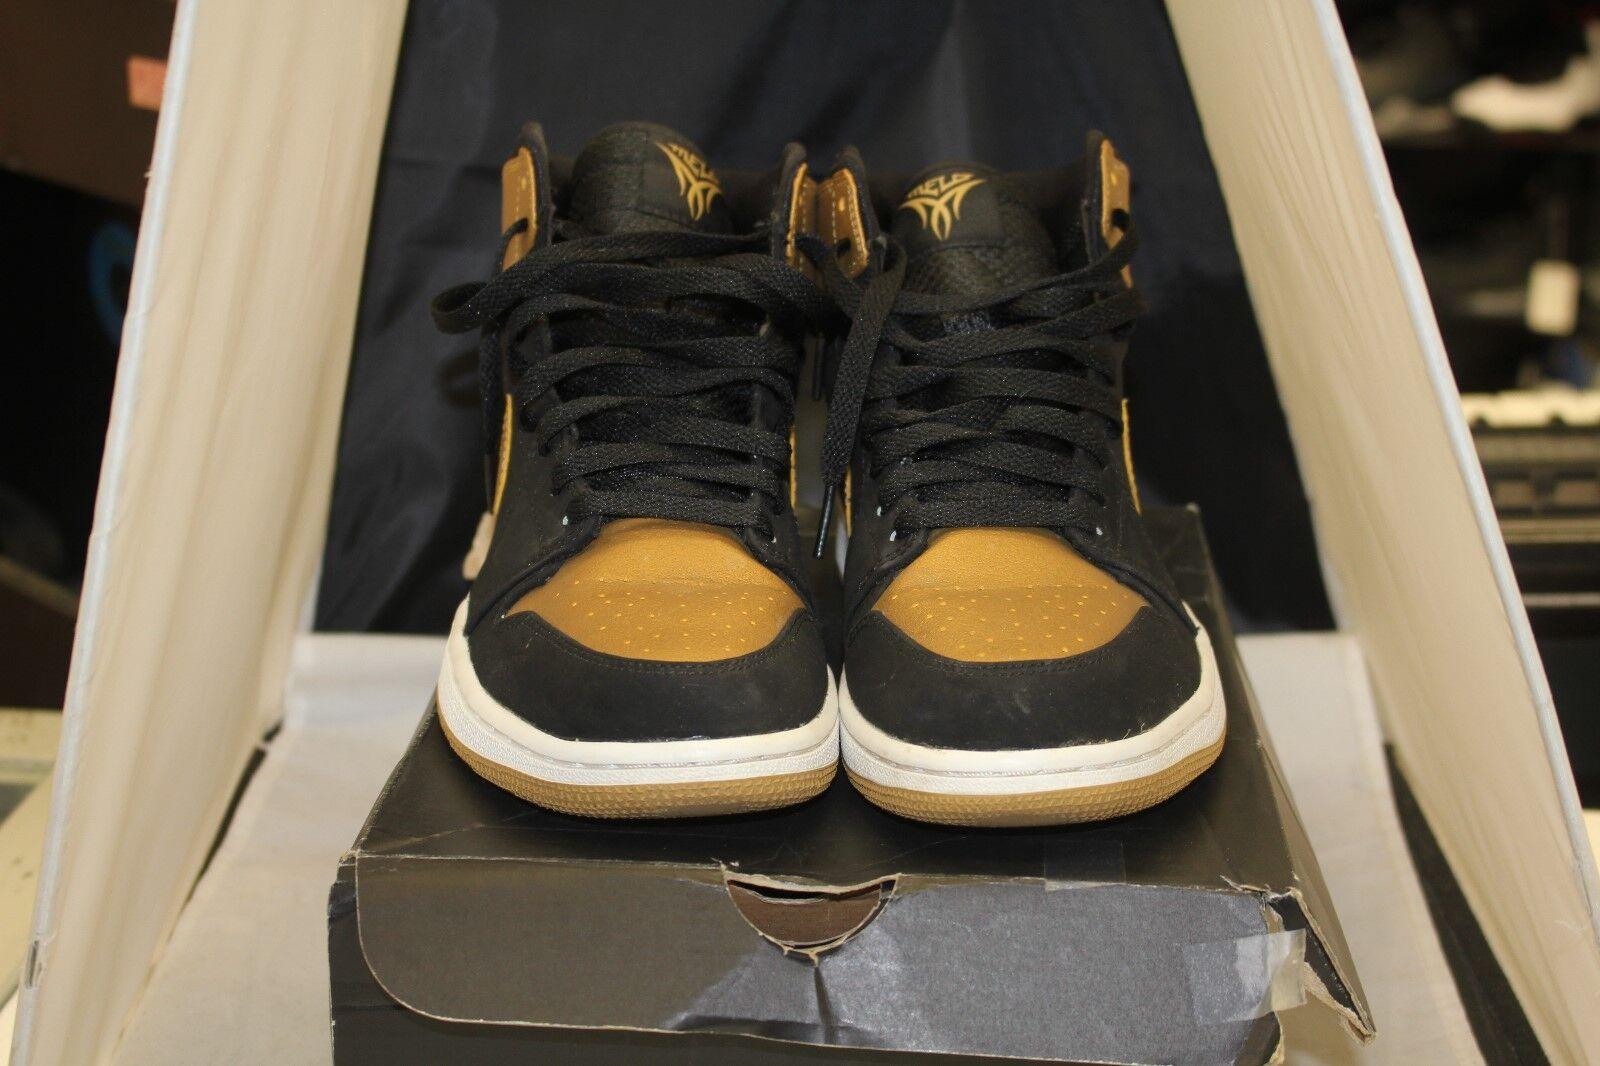 Nike Air Jordan Retro 1 One 332550-026 High Melo Nero Gold Size 8.5